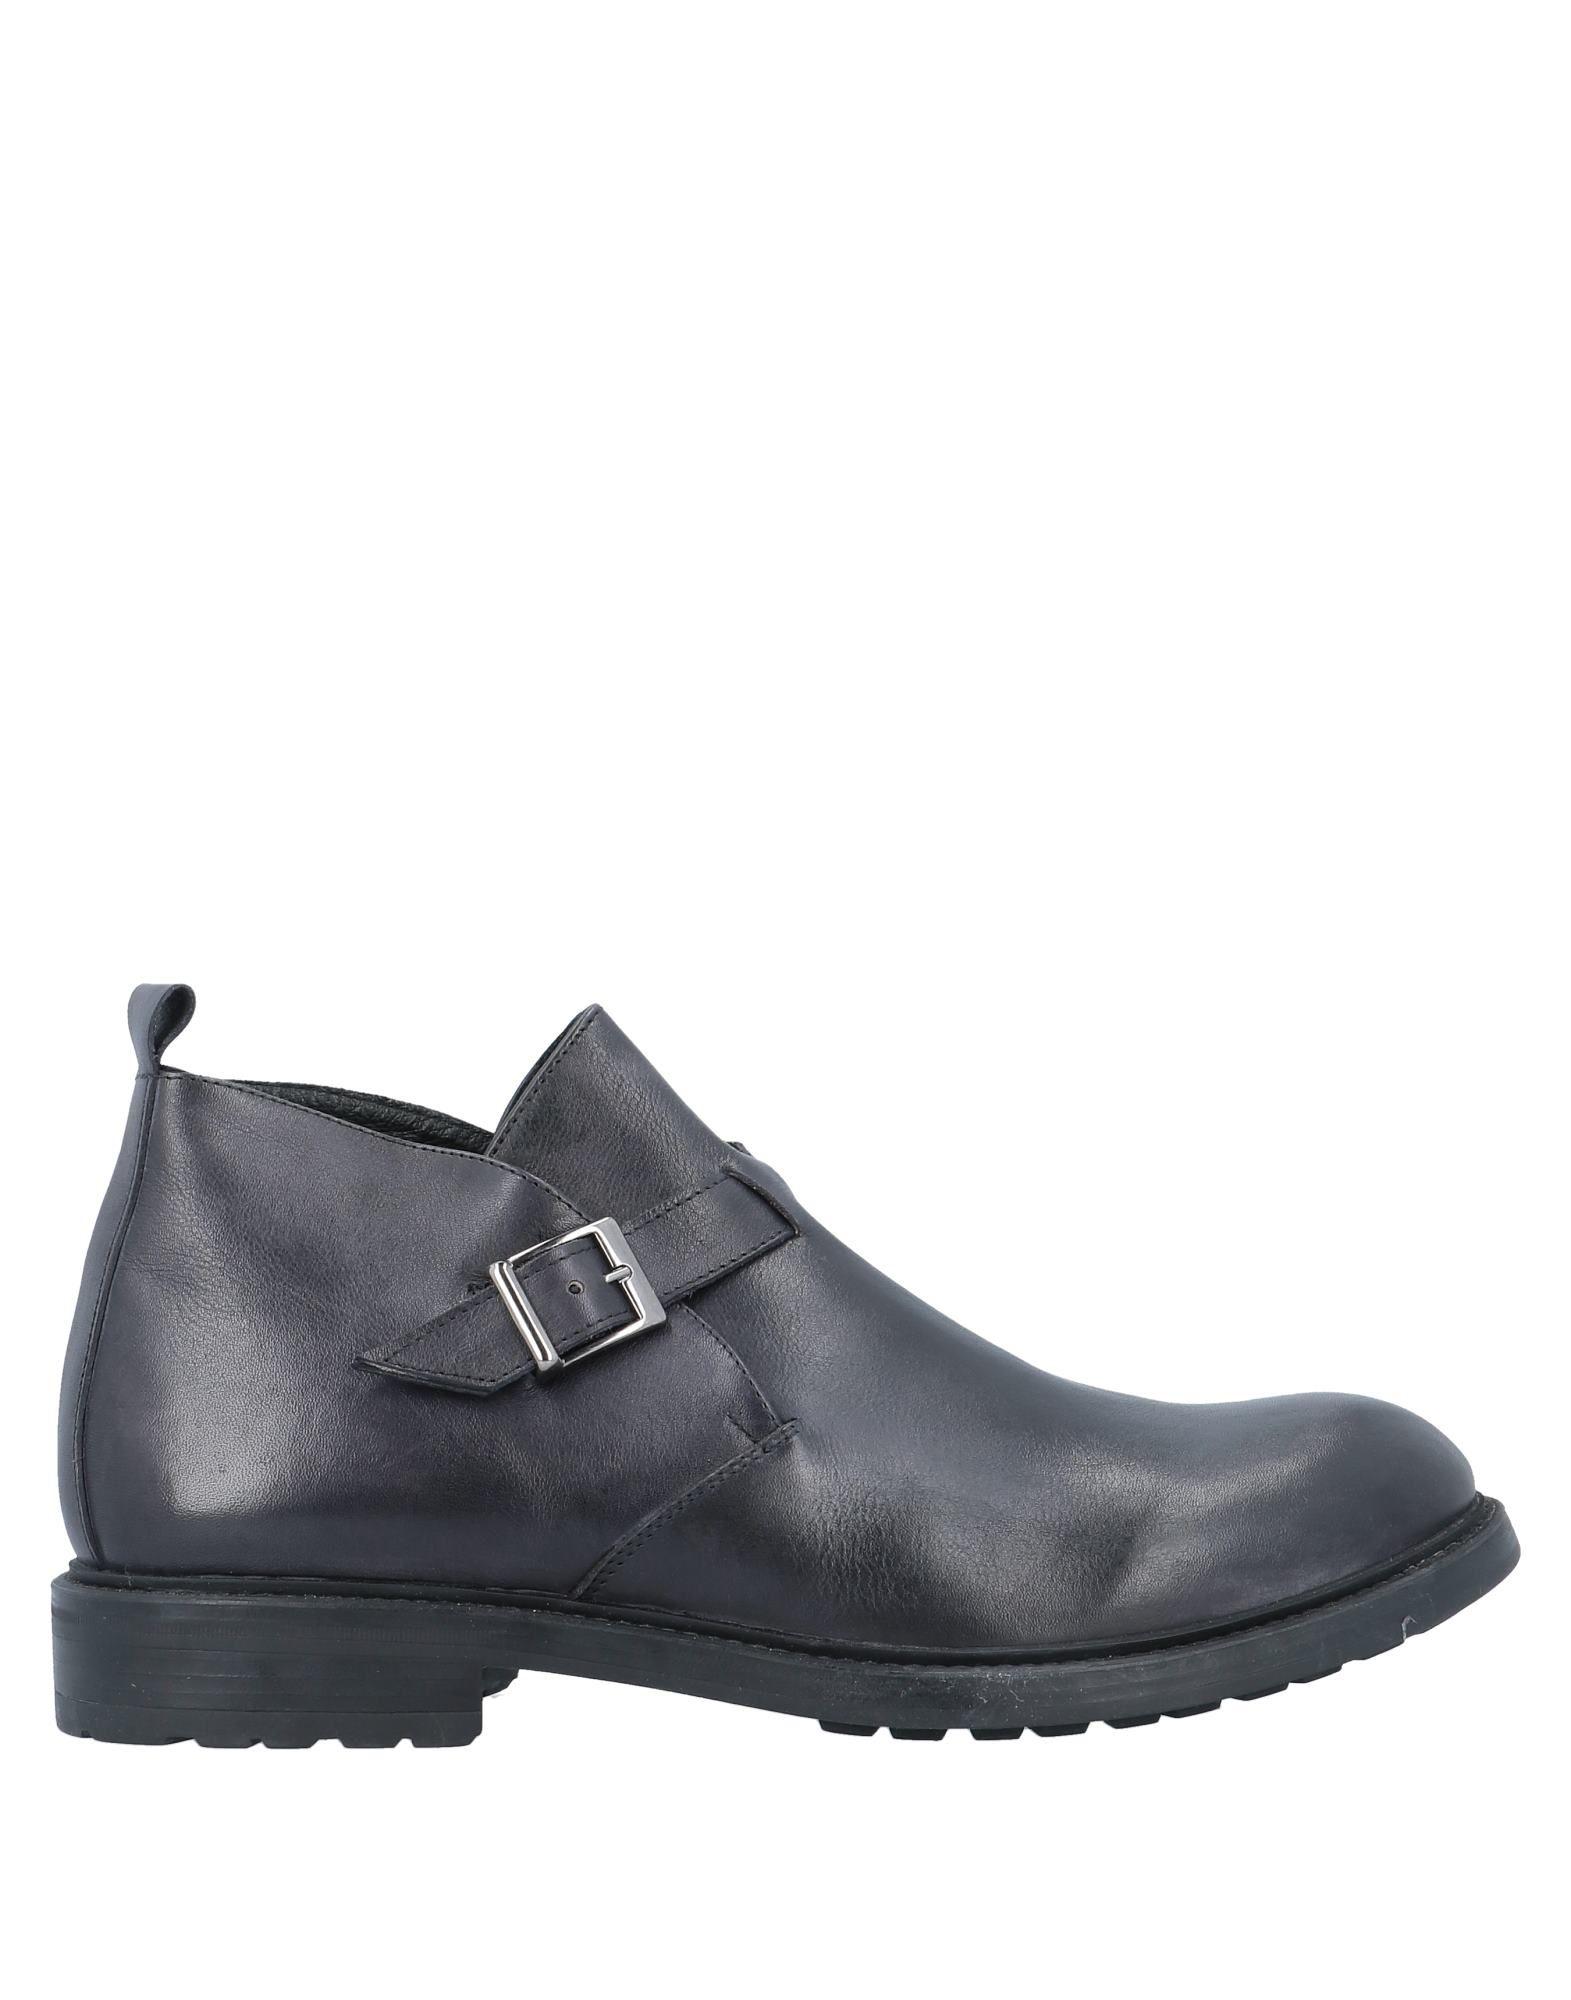 BRUNO BONELLI Полусапоги и высокие ботинки bruno bonelli полусапоги и высокие ботинки